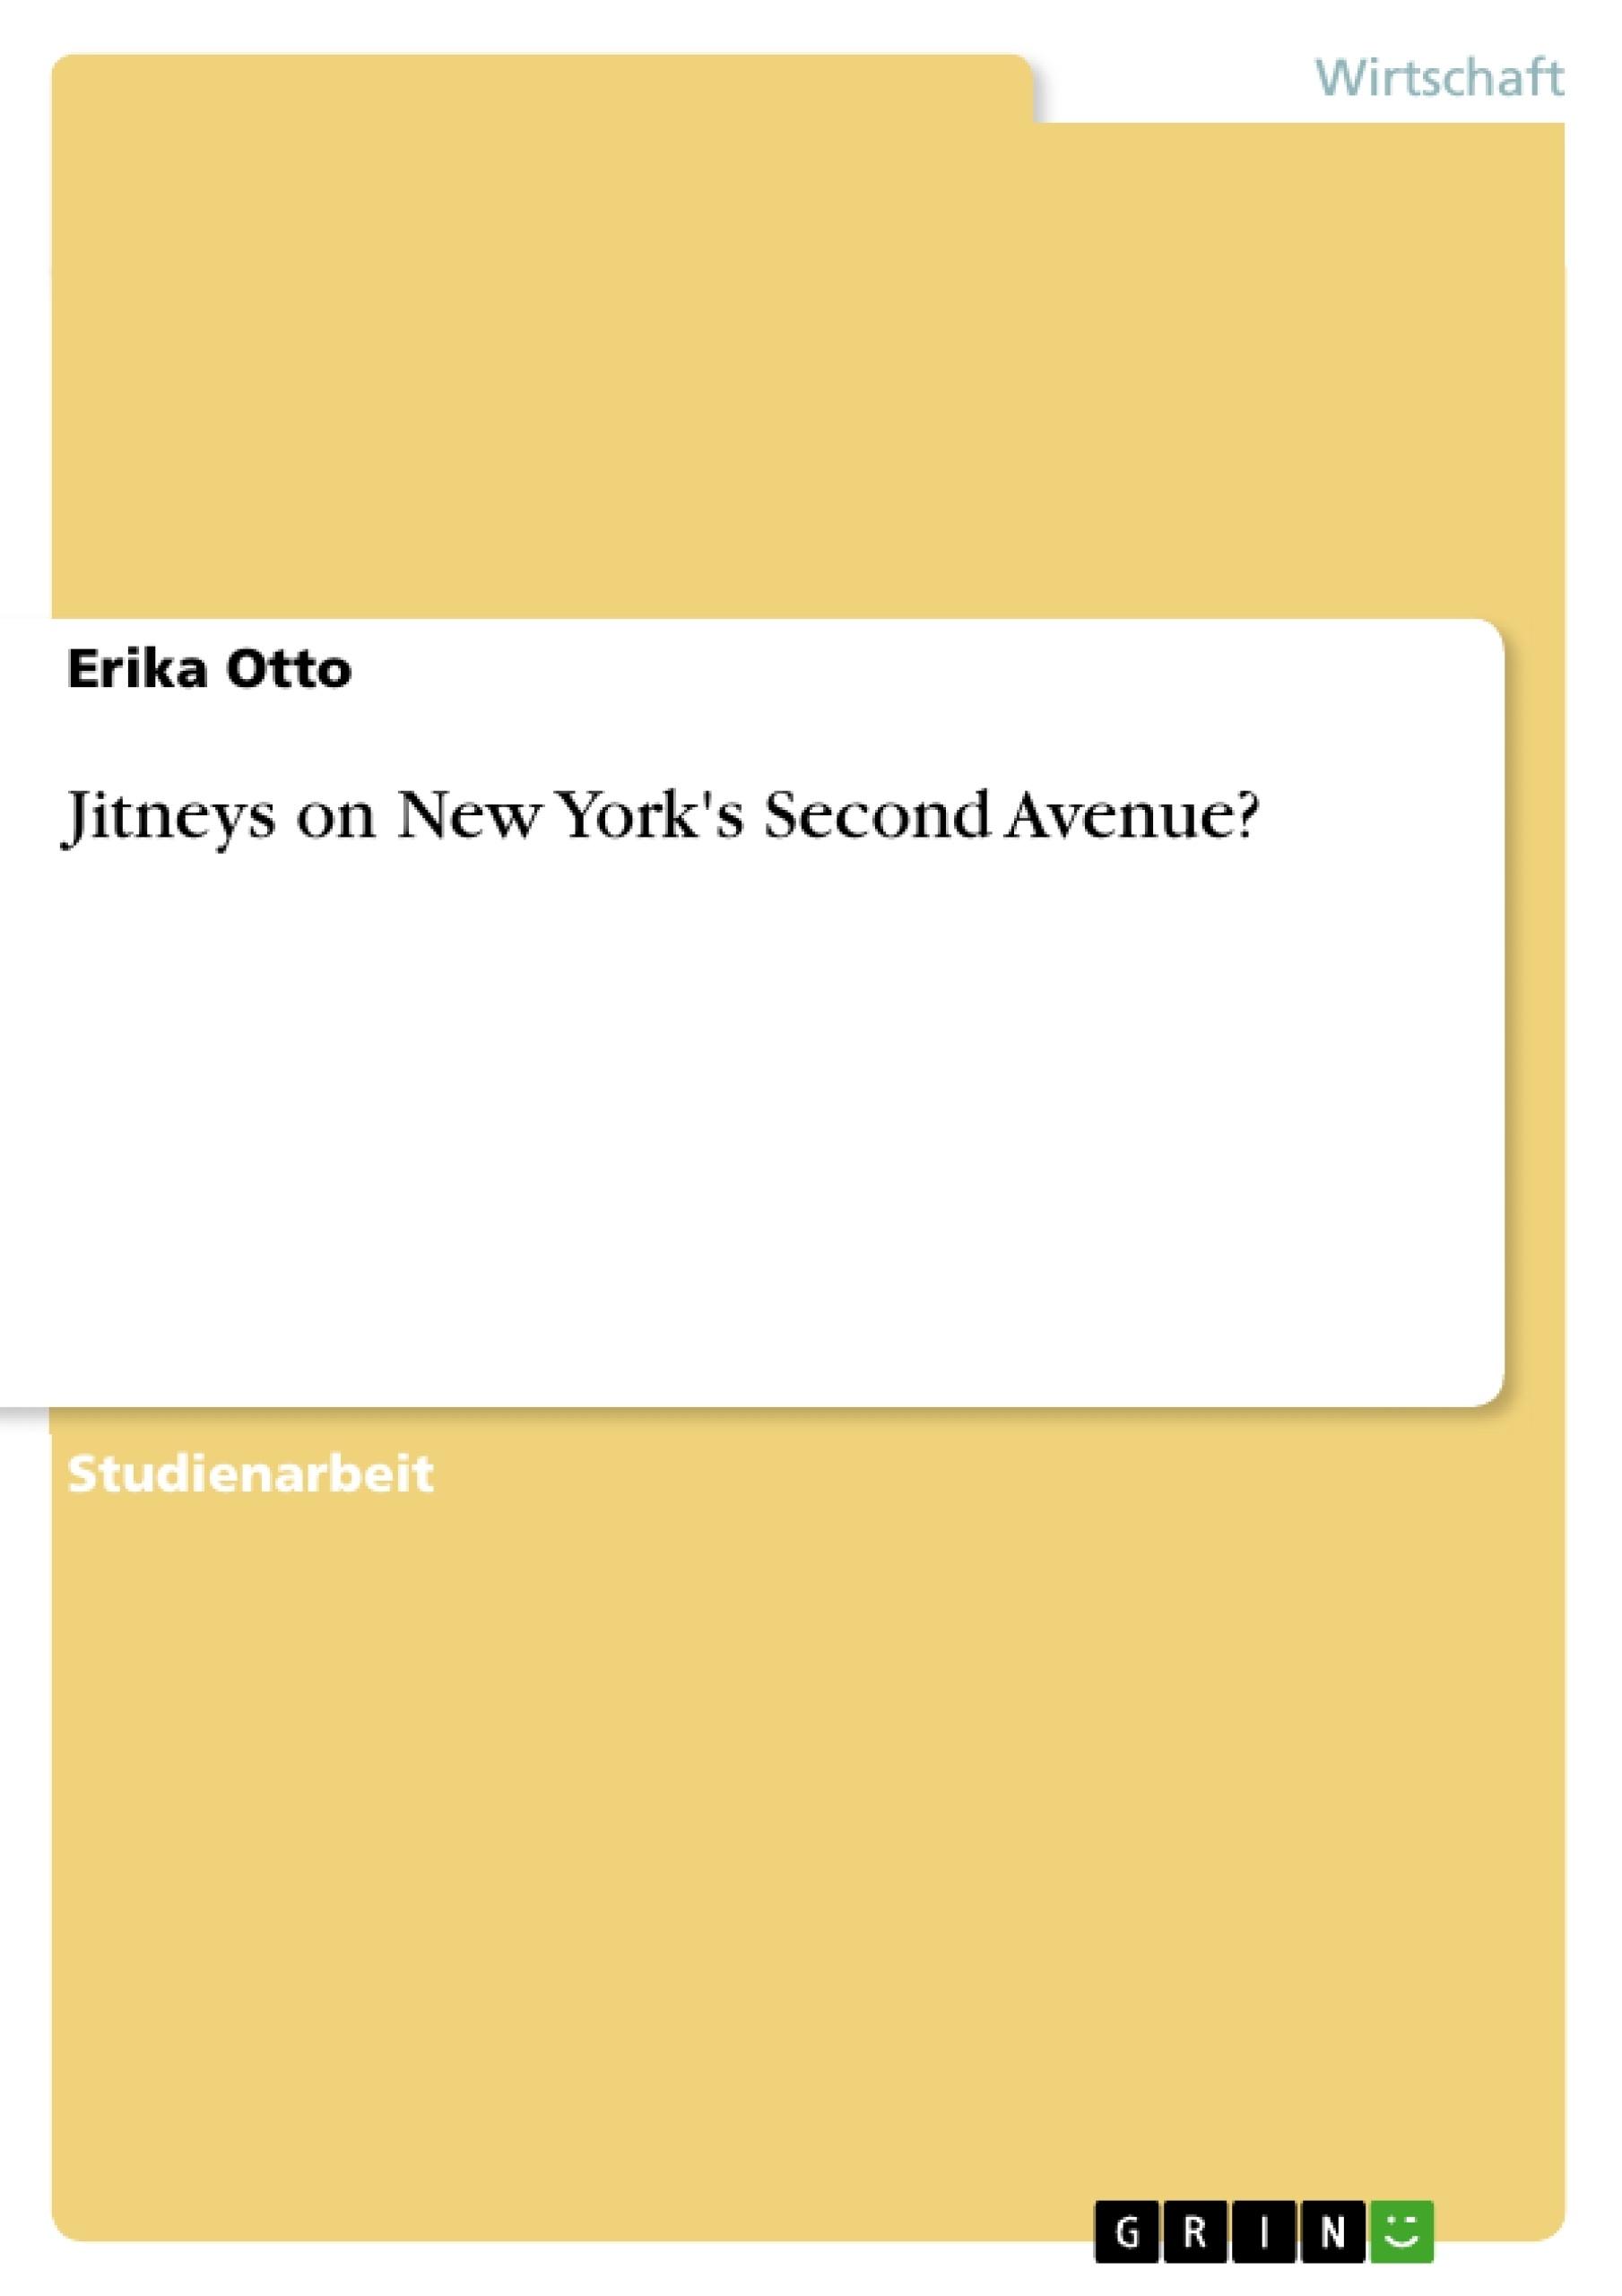 Titel: Jitneys on New York's Second Avenue?